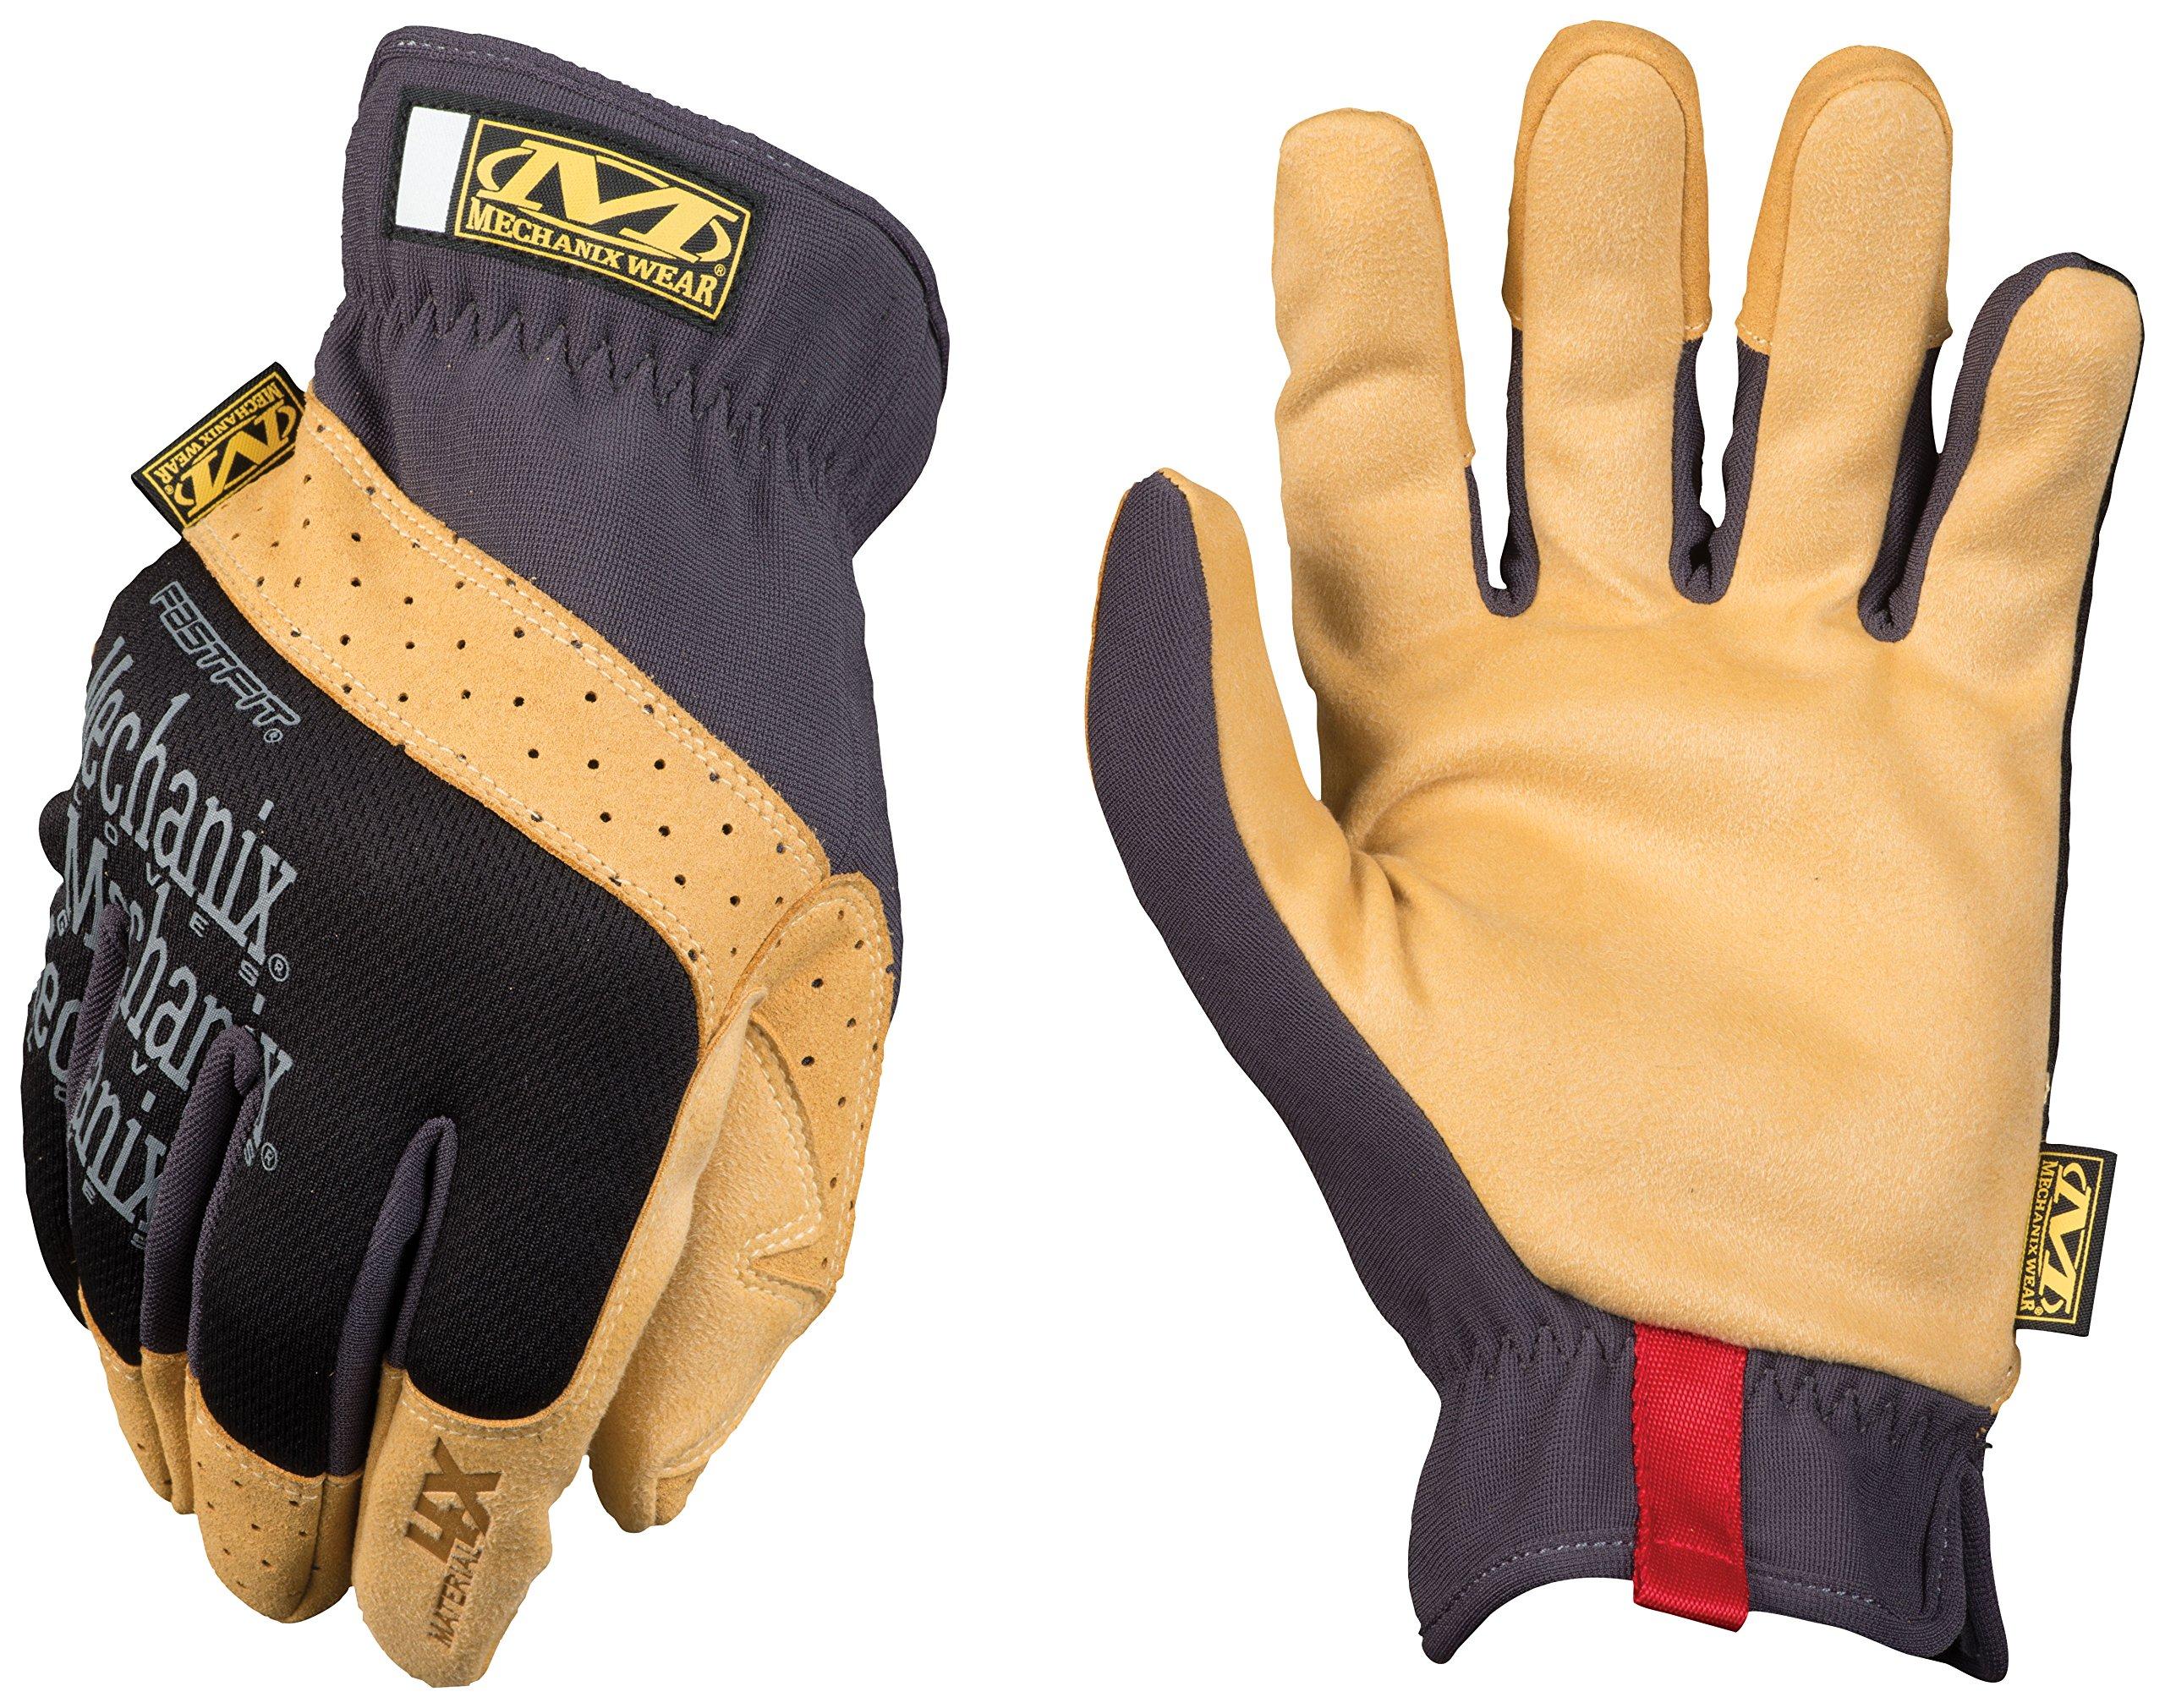 Mechanix Wear - Material4X FastFit Work Gloves (Medium, Brown/Black)